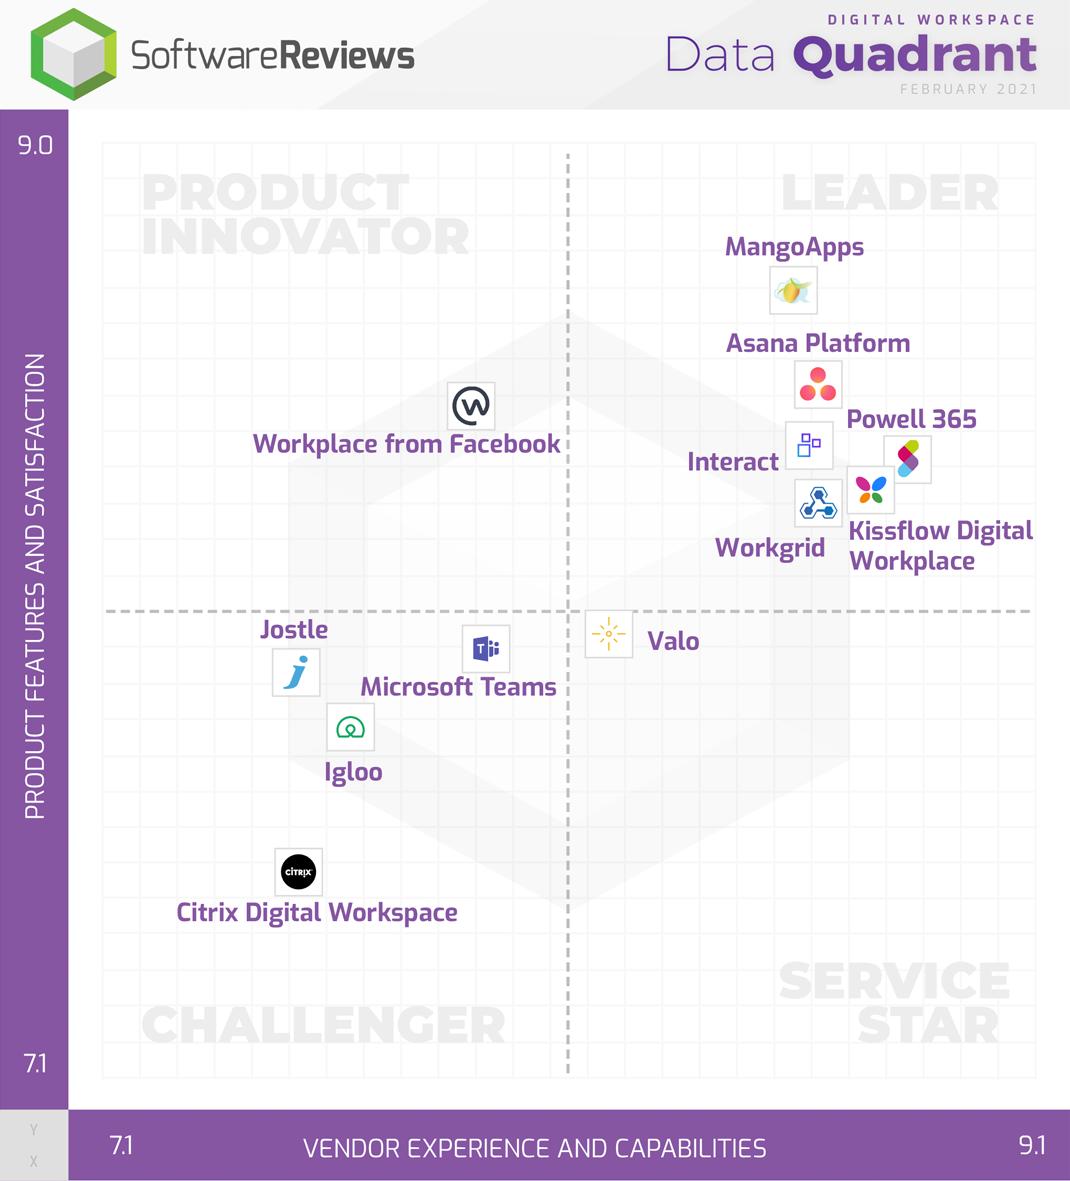 Digital Workspace Data Quadrant